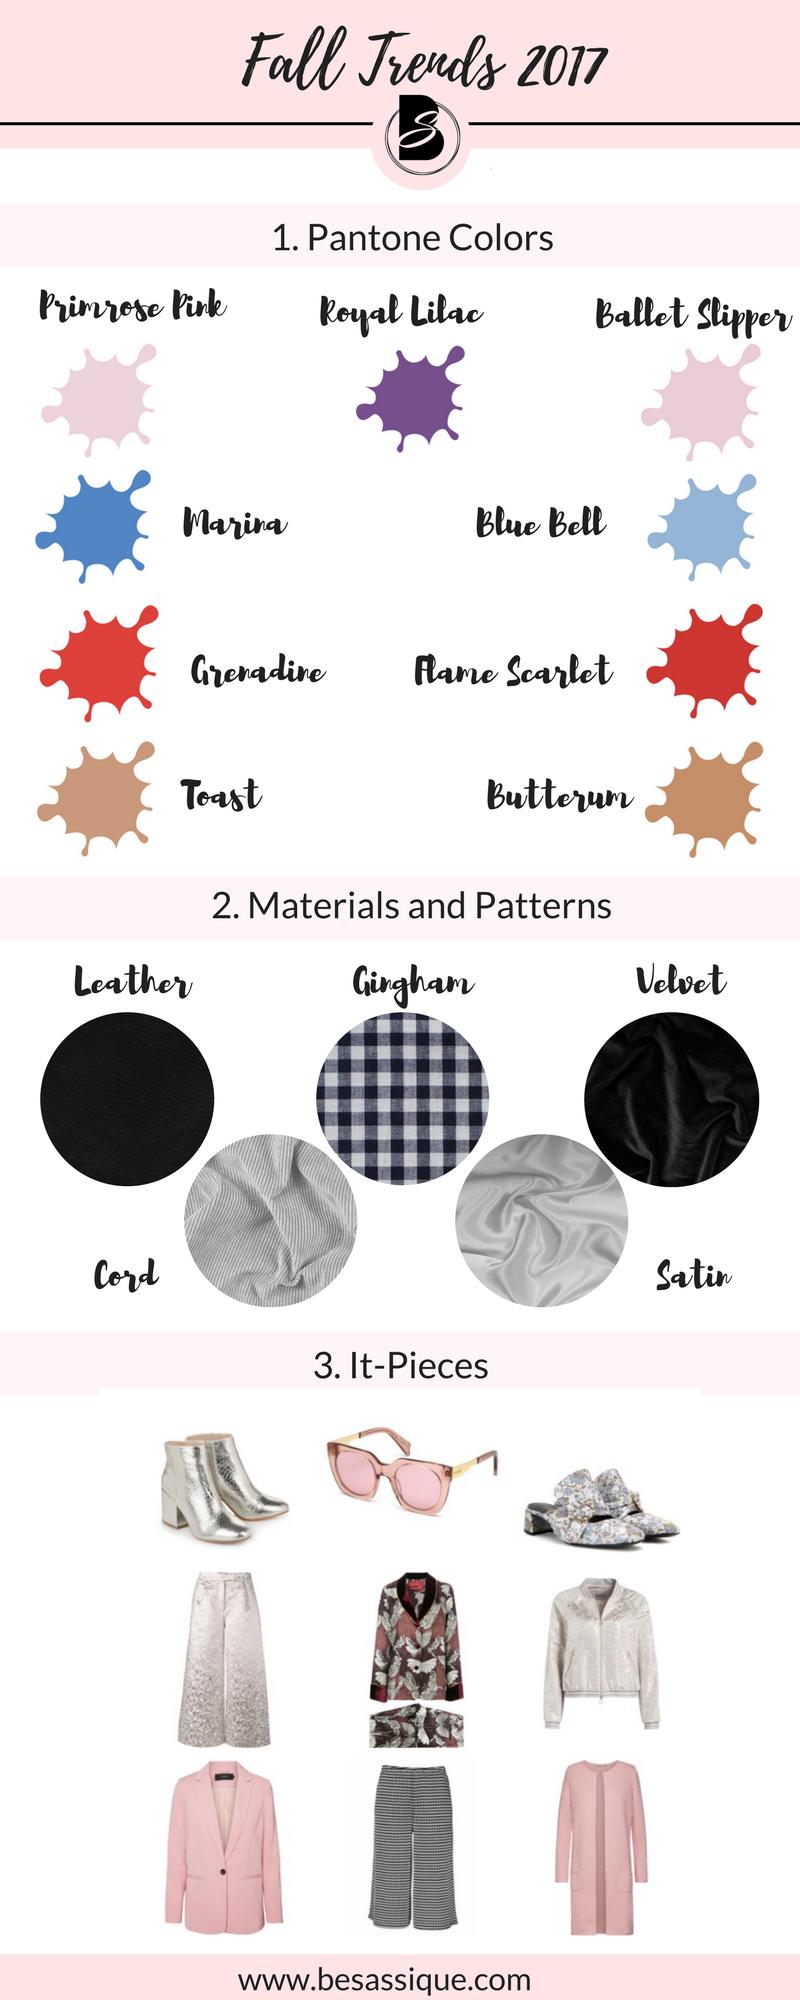 fall trends 2017 herbsttrends 2017 modetrends herbst winter 2017 pantone fashion color report. Black Bedroom Furniture Sets. Home Design Ideas